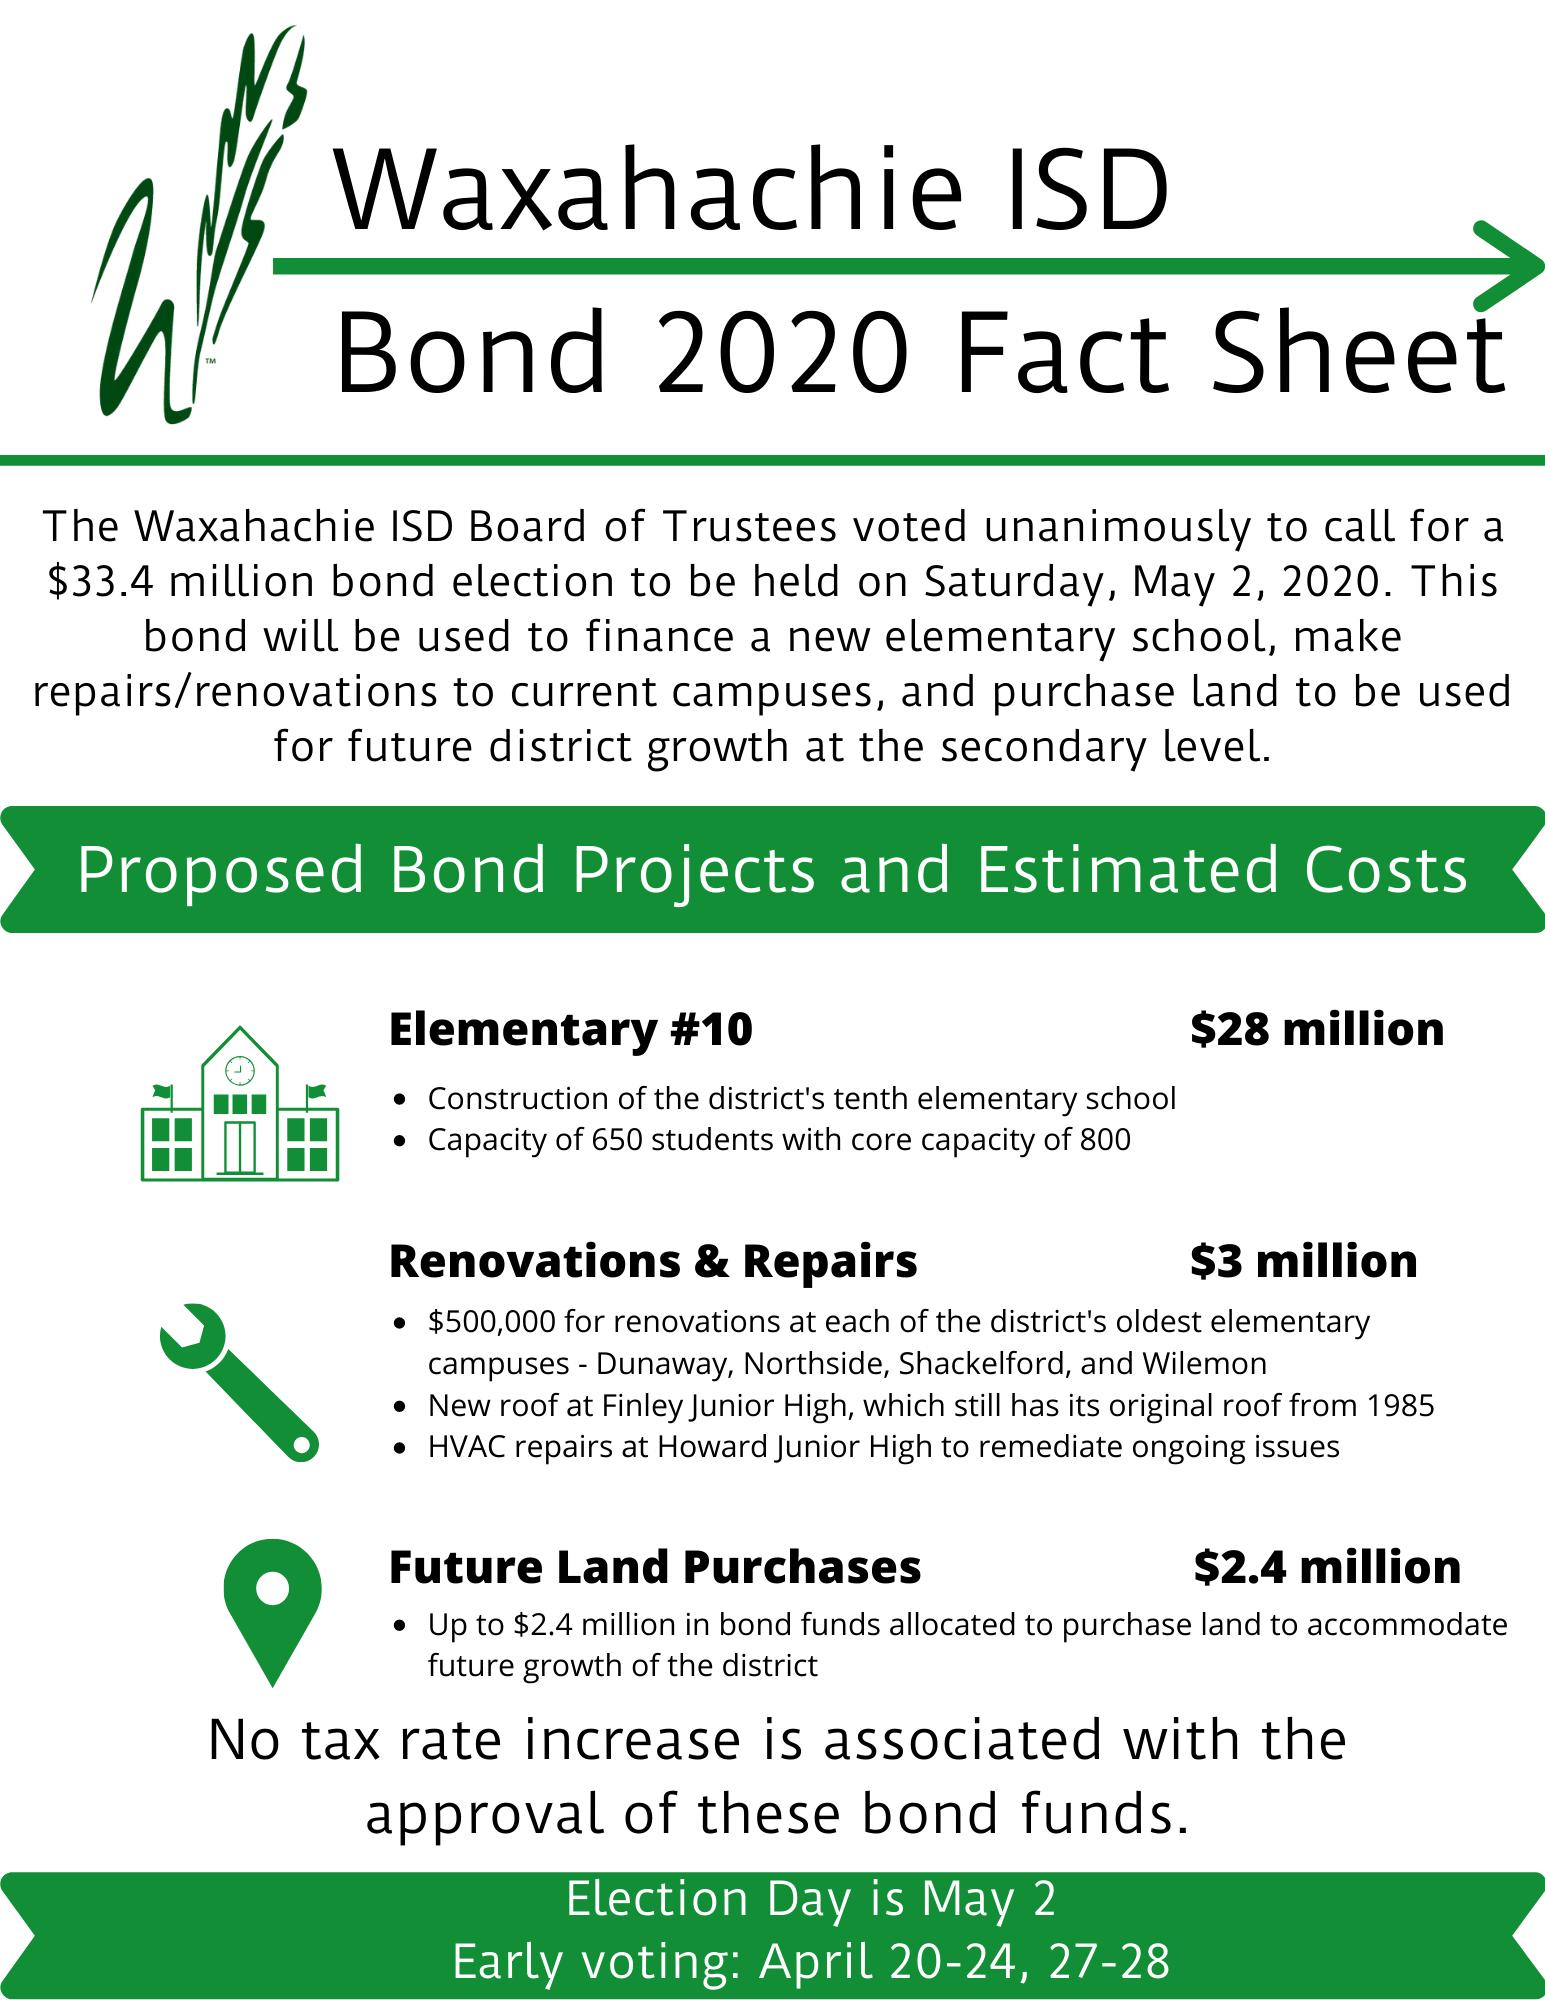 Bond 2020 info